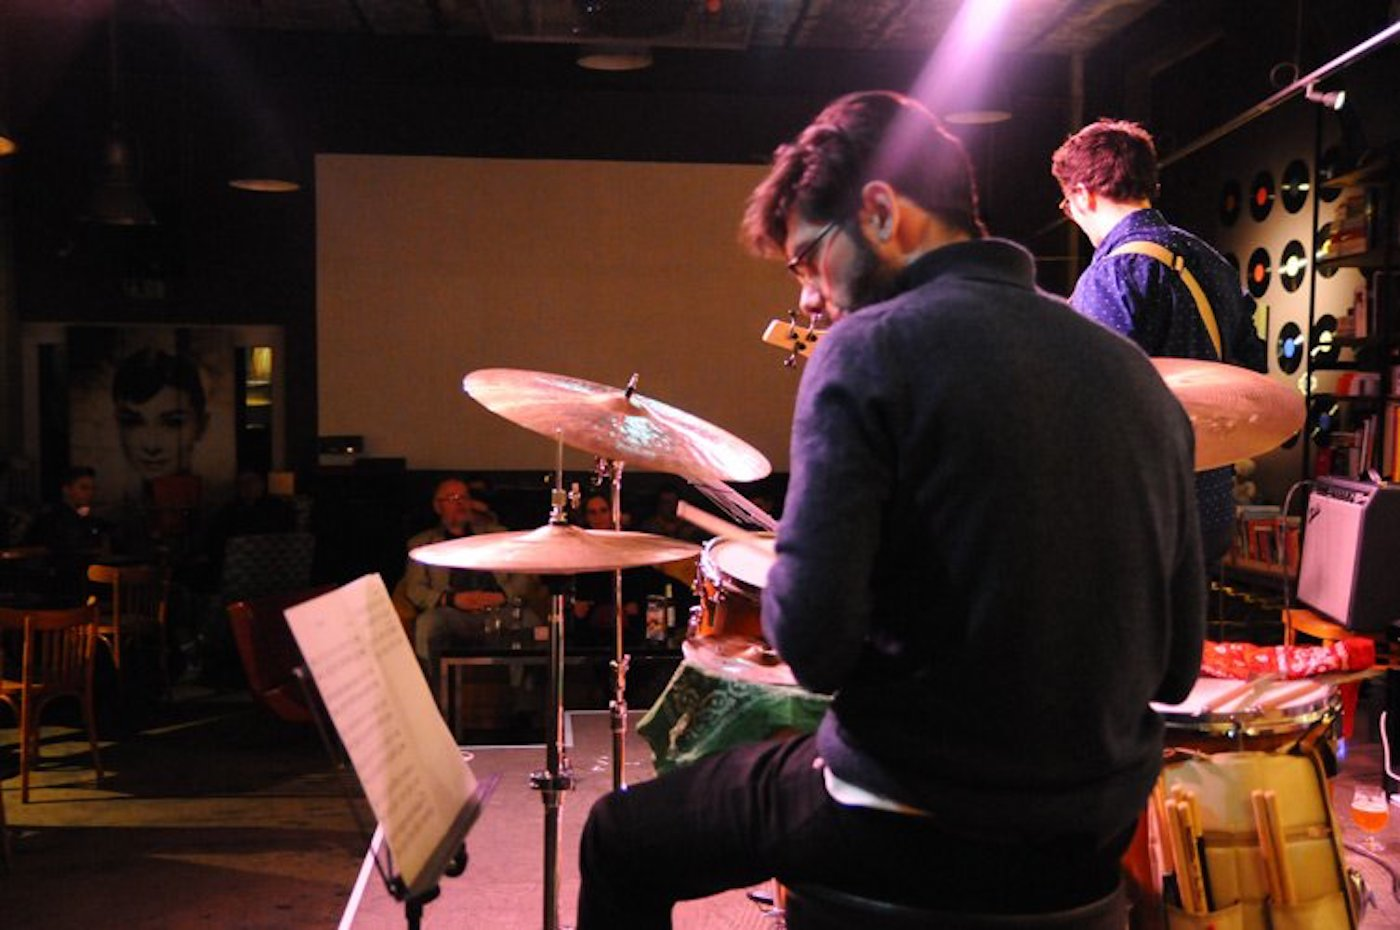 Un concerto all'Ancien Cinéma Café Club 23 di Vianden